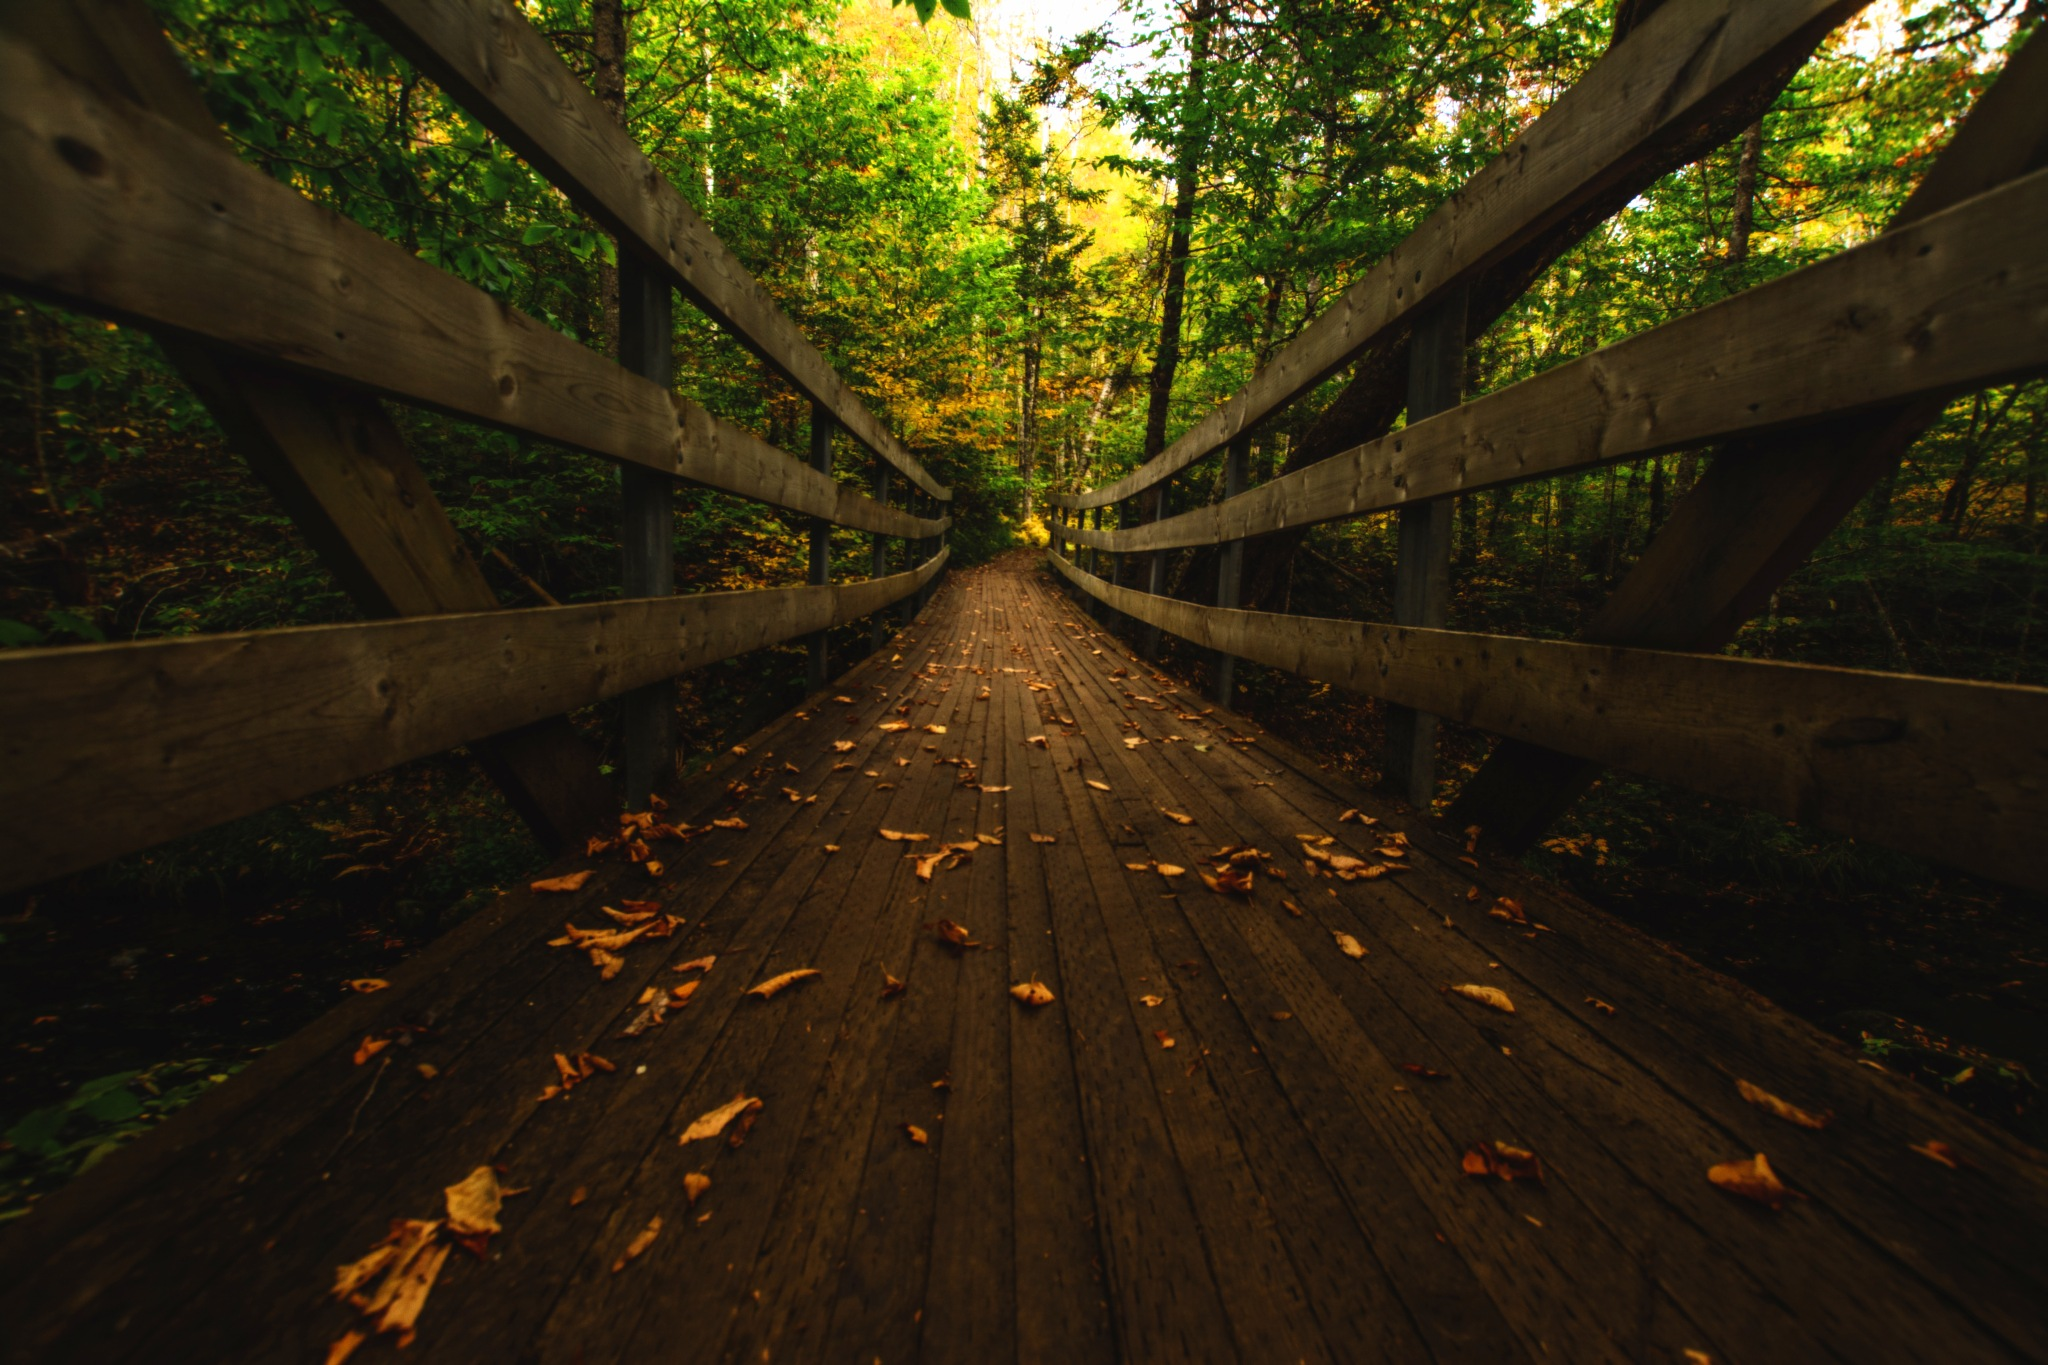 Crossing the River by Jesse Kalberlah